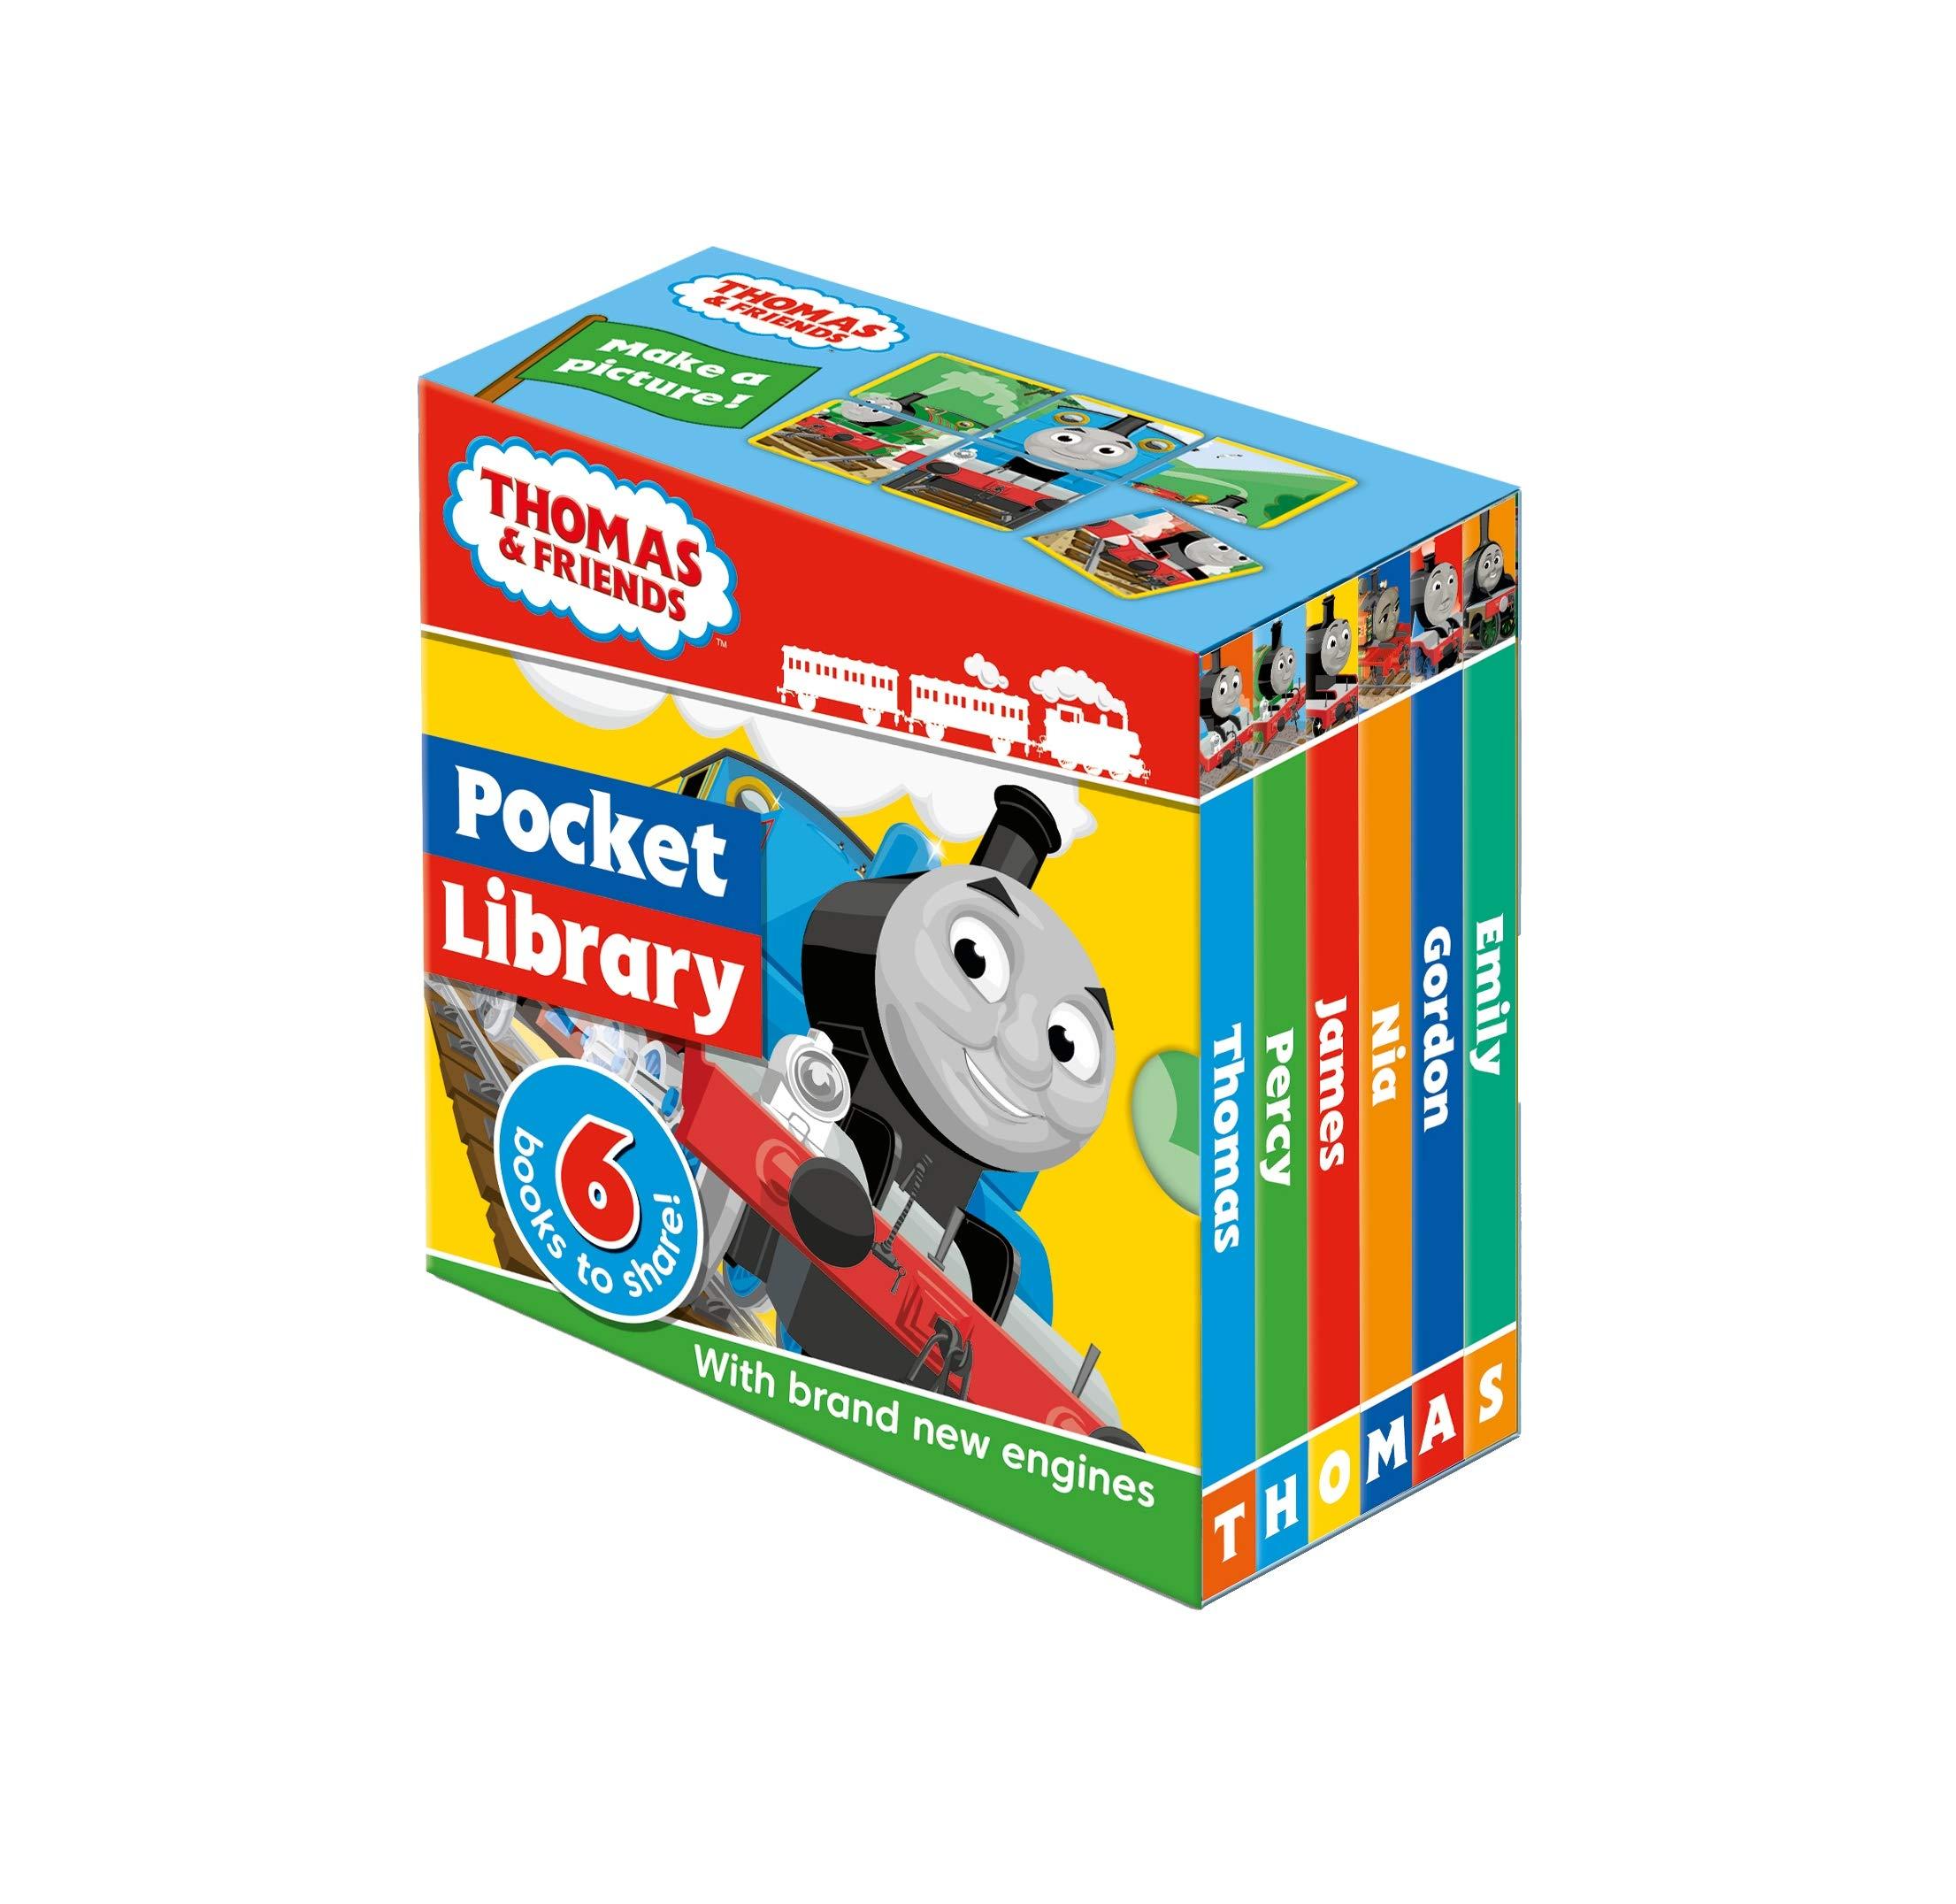 Thomas & Friends: Pocket Library: Amazon.es: Egmont Publishing UK: Libros en idiomas extranjeros